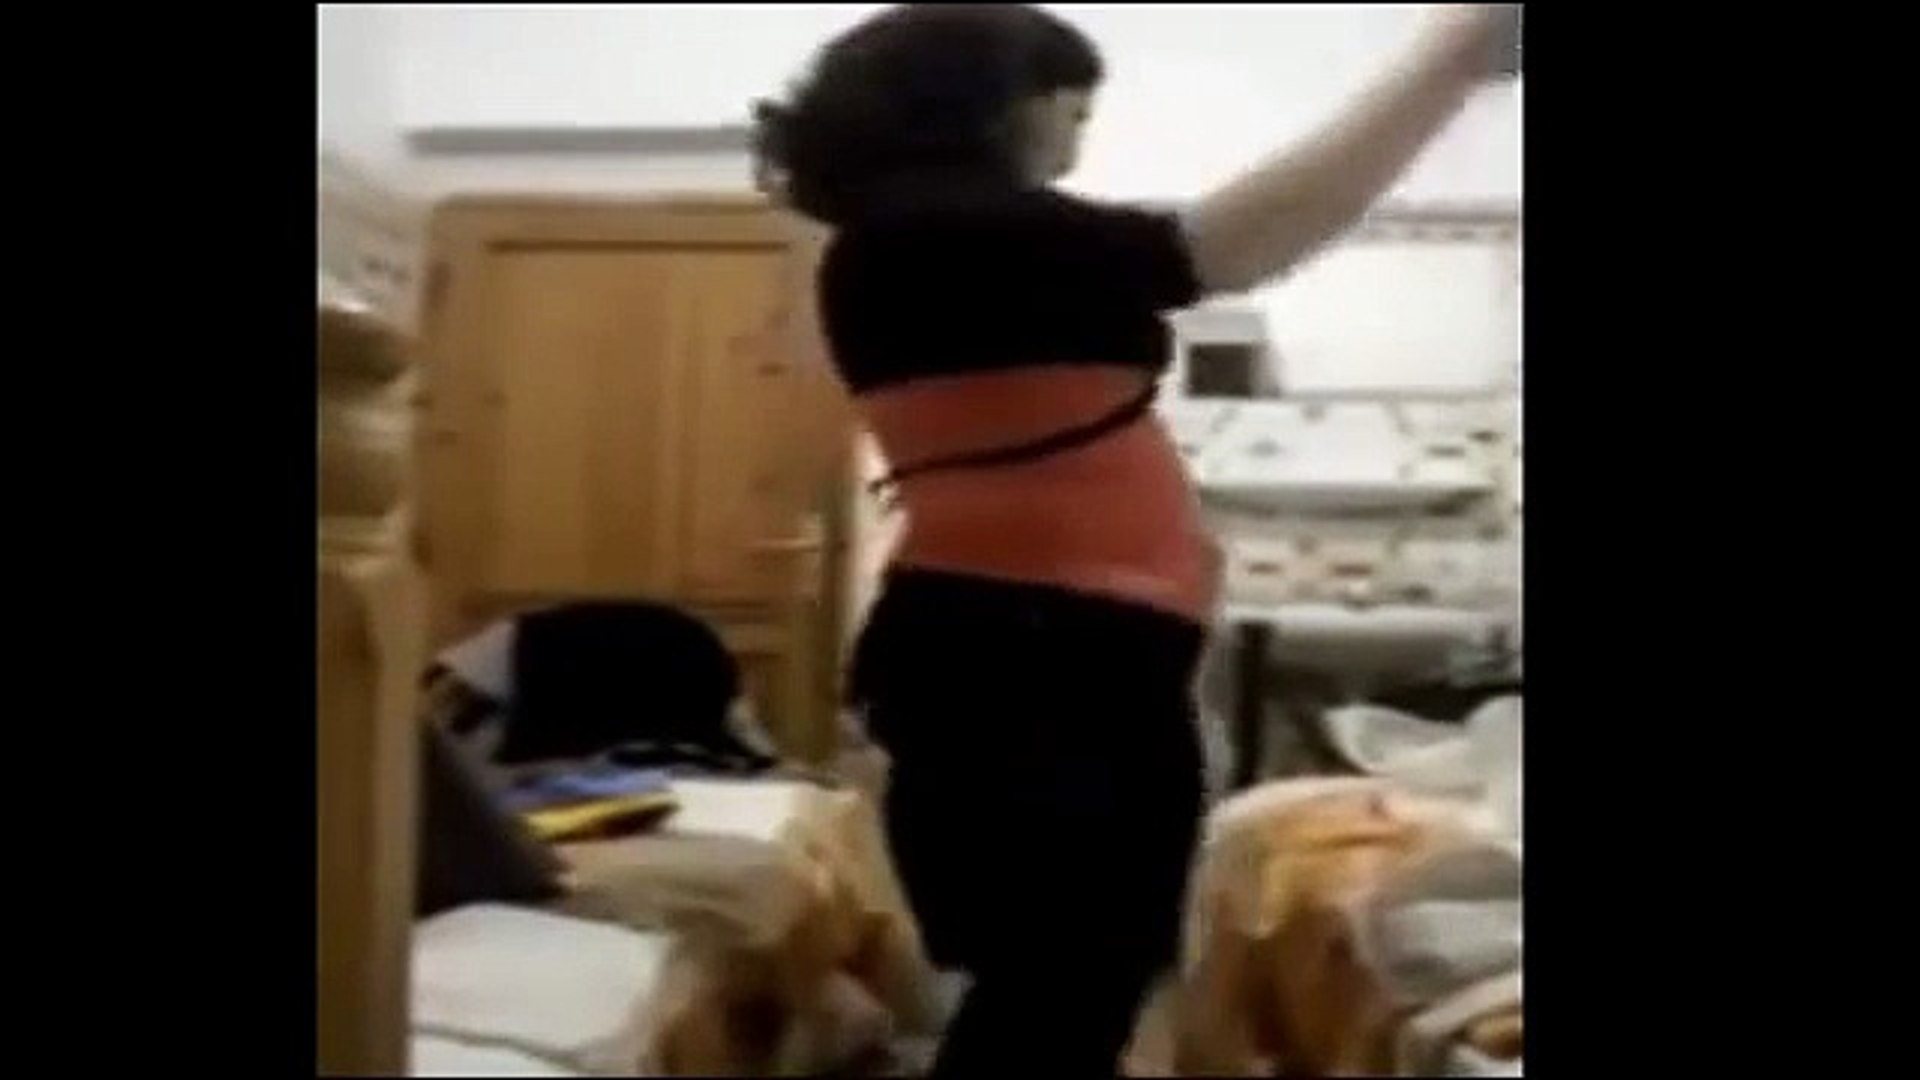 رقص منازل جديد رقص بلدي خاص بلدي 2015 sAFA daNCE